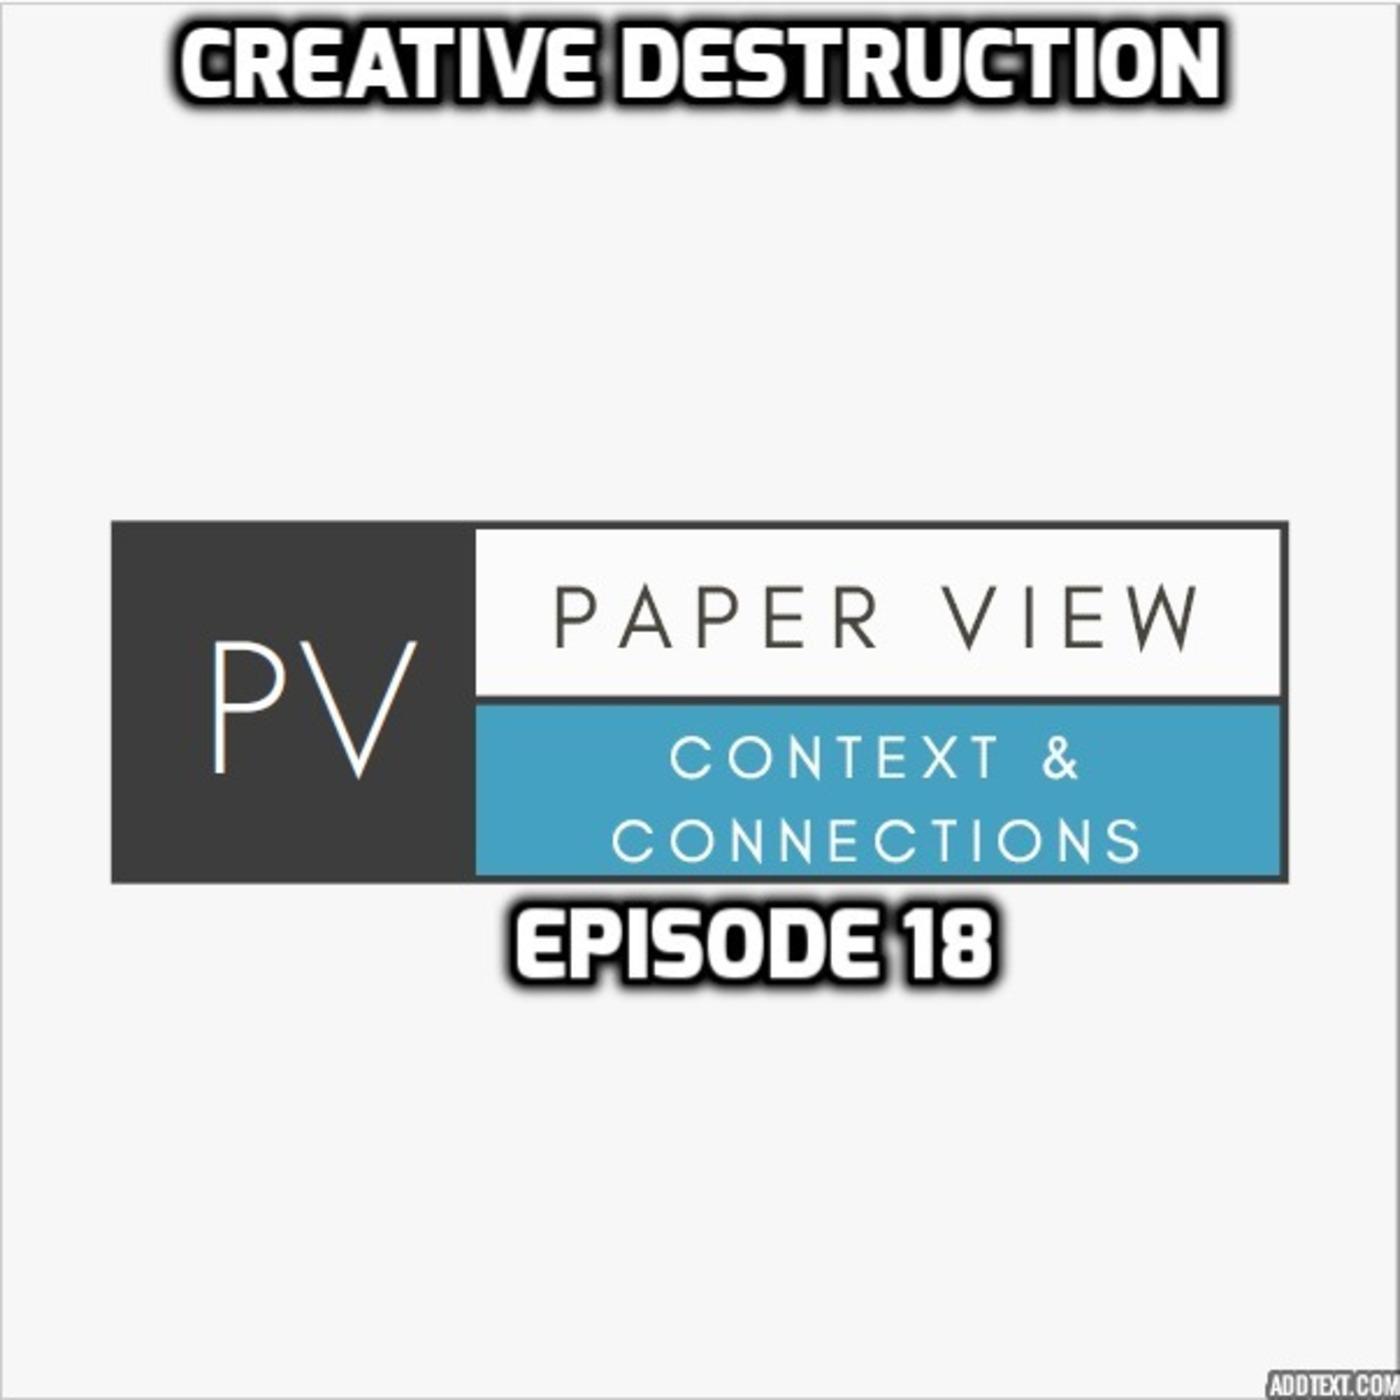 Paper View Episode 18 Creative Destruction Paper View Podcast